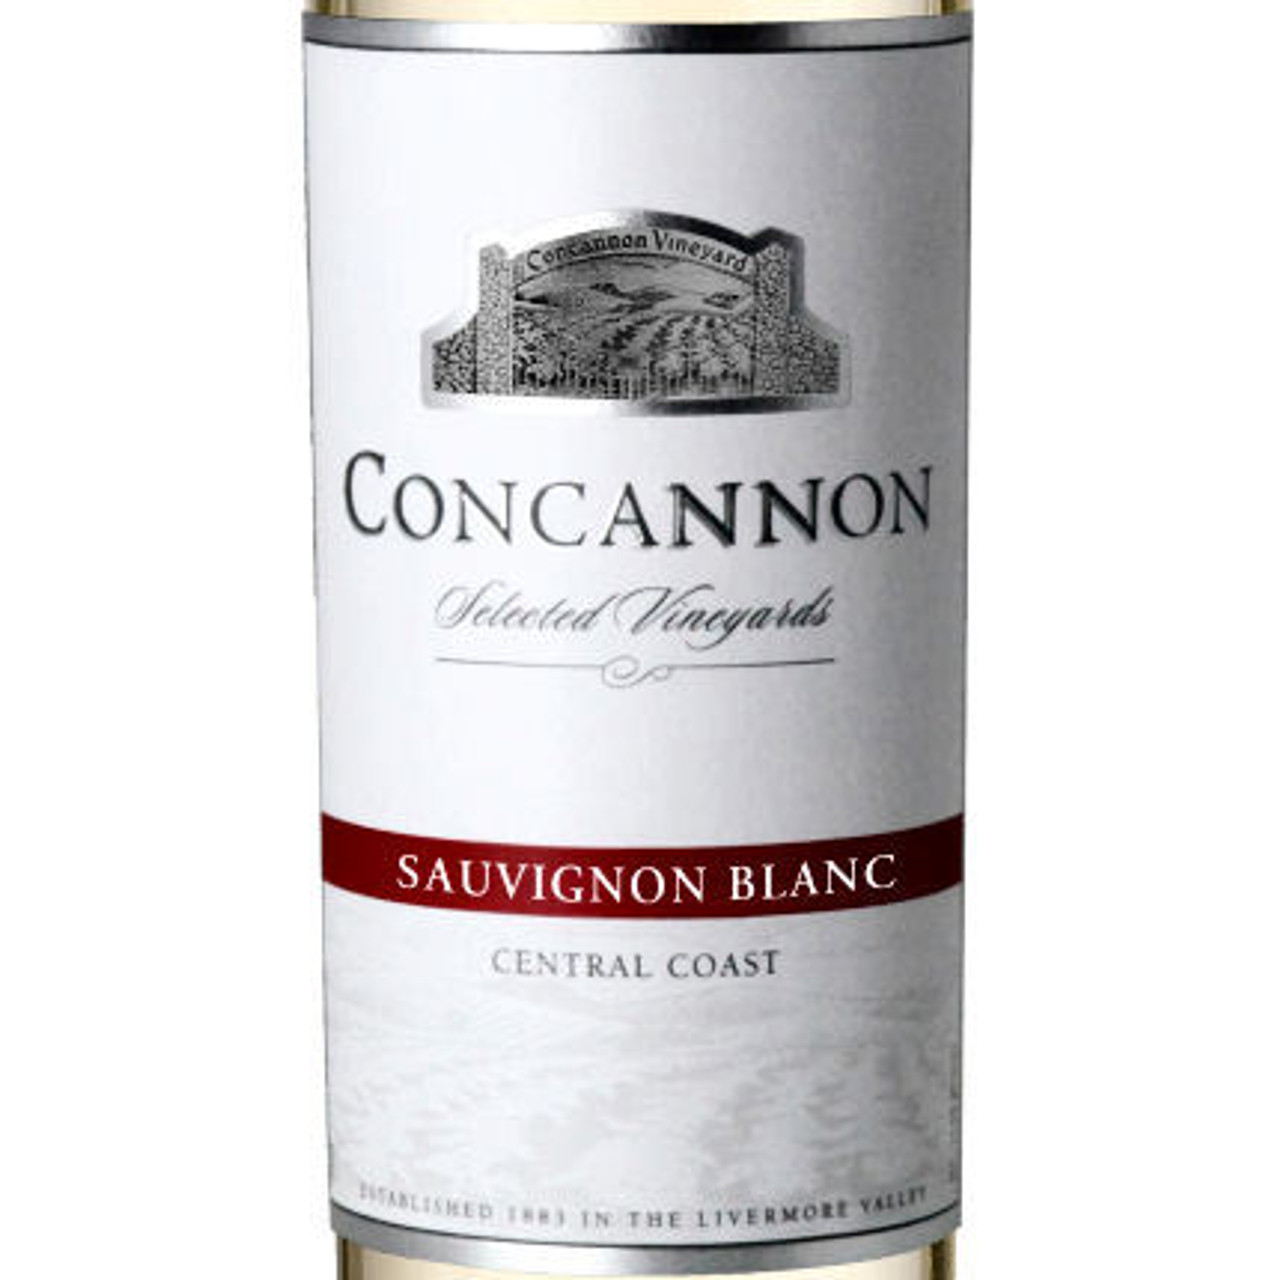 Concannon Selected Vineyards Central Coast Sauvignon Blanc